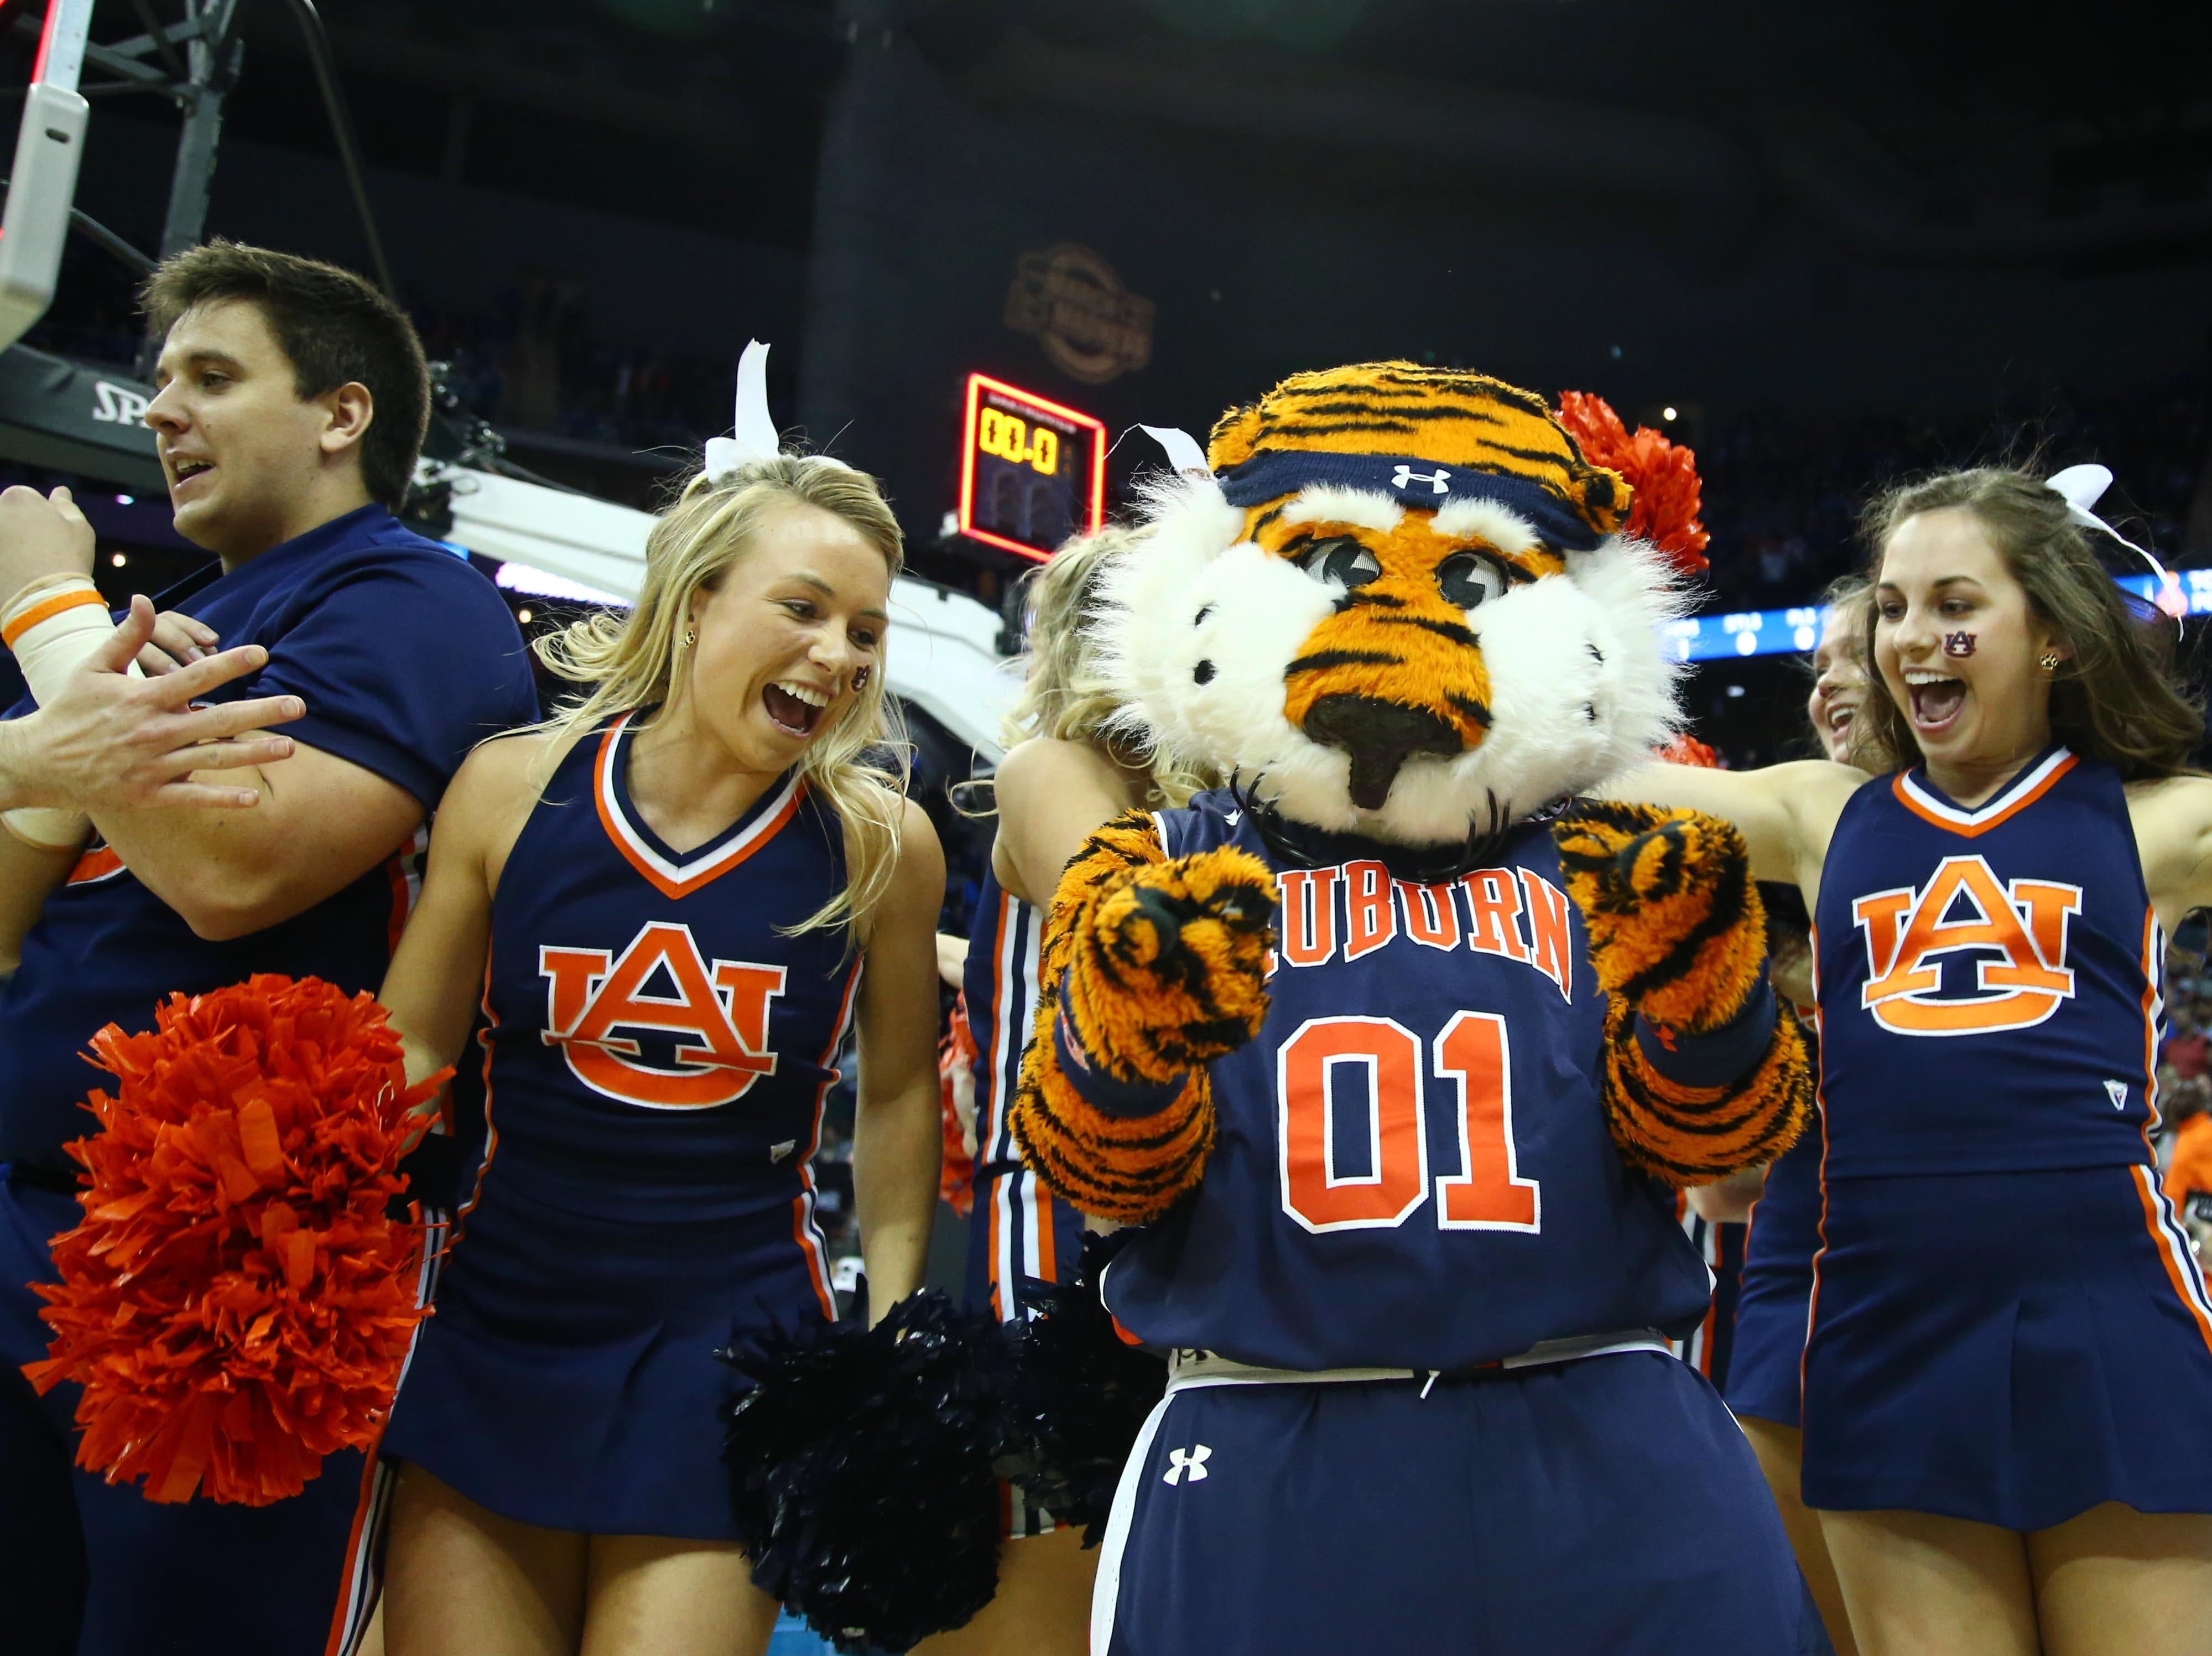 Sweet 16: Auburn Tigers cheerleaders and the mascot celebrate the win over North Carolina.